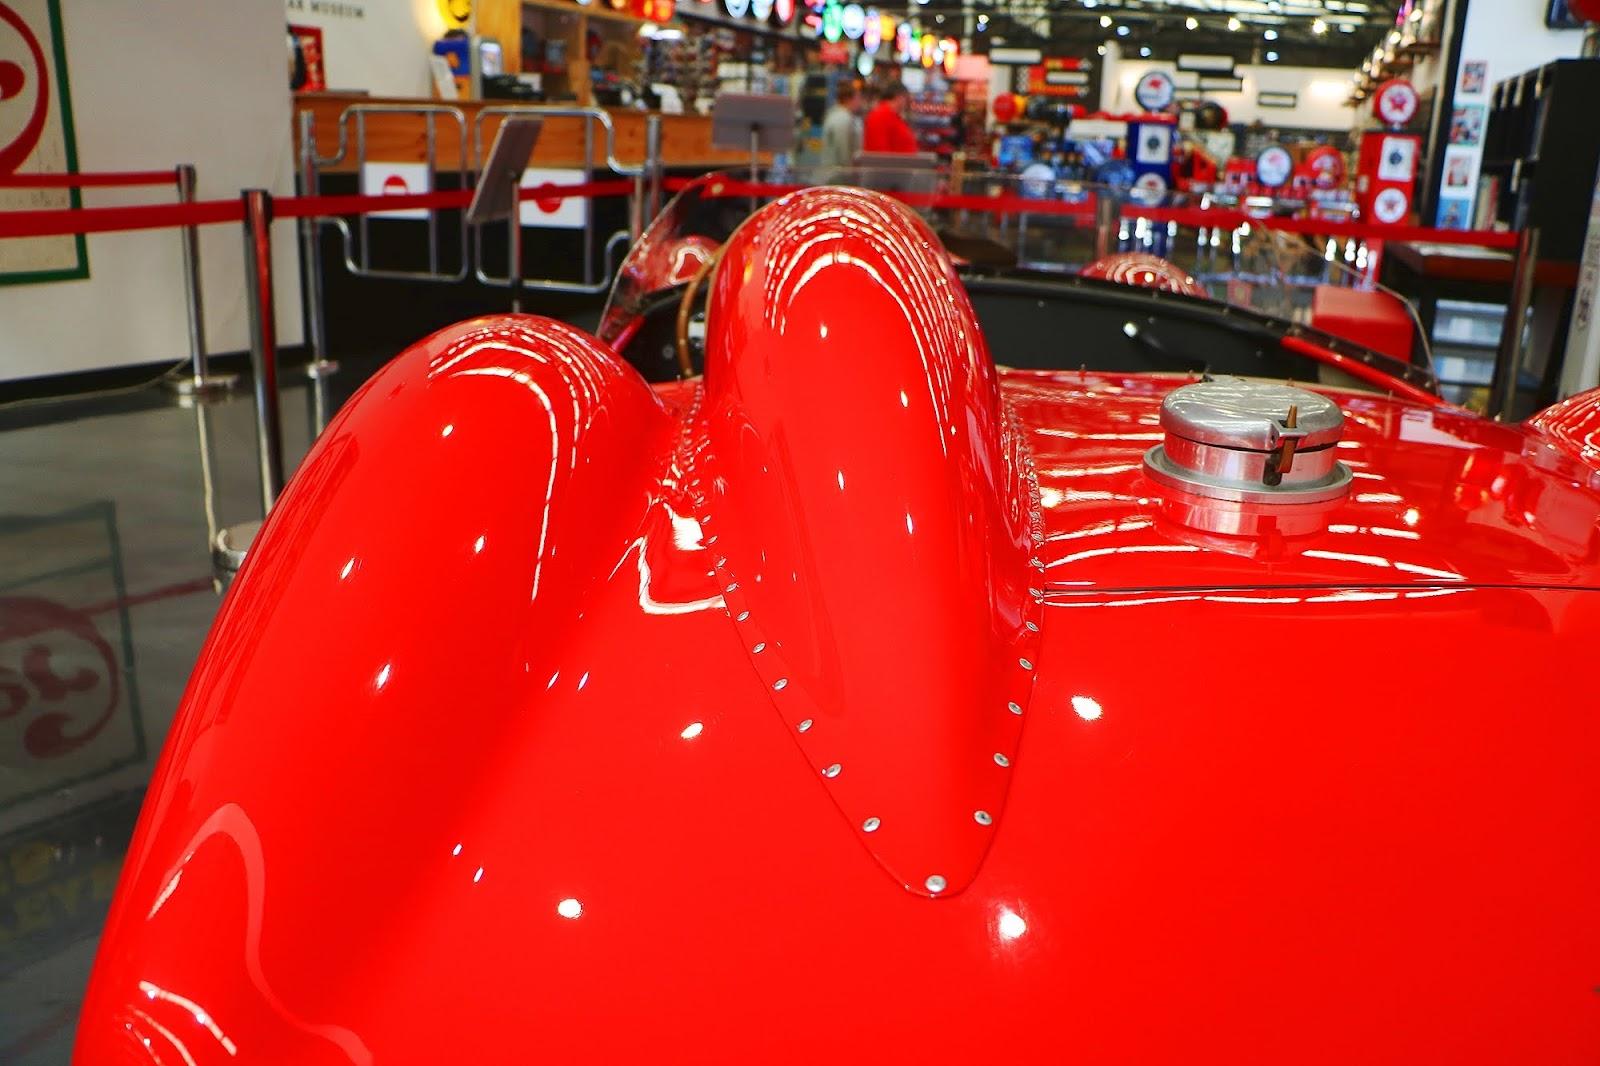 1969 Ferrari 250 Testarossa Replica (17).jpg